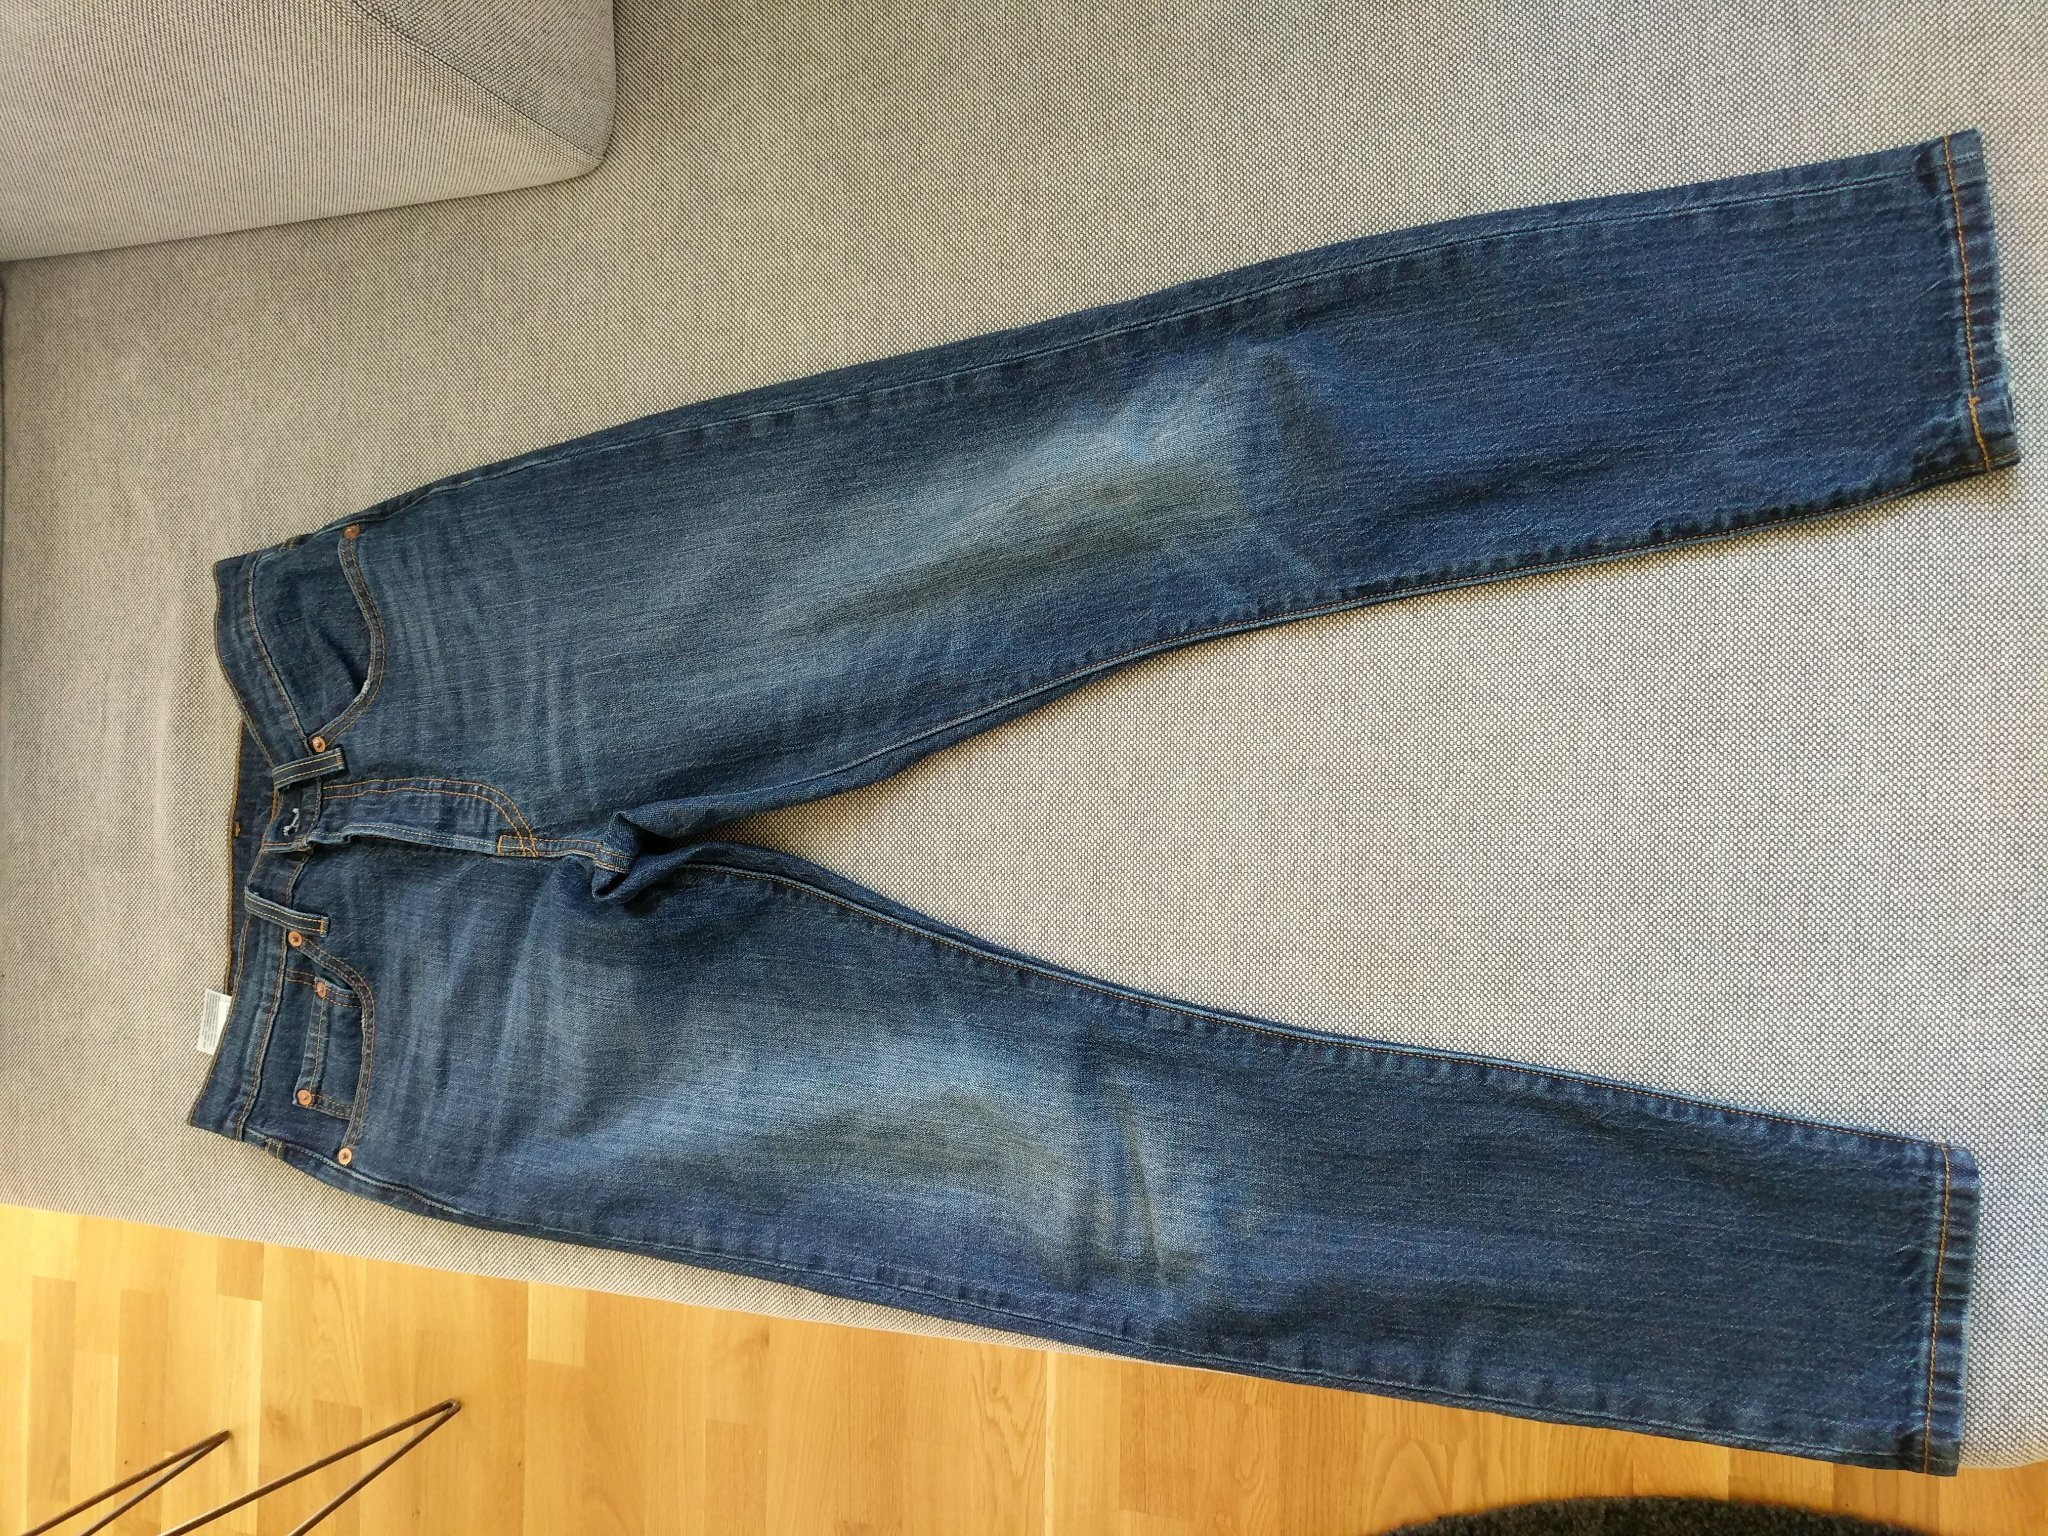 e42f221be8d Levis jeans, 501 Slim, storlek 27/28 (350751493) ᐈ Köp på Tradera